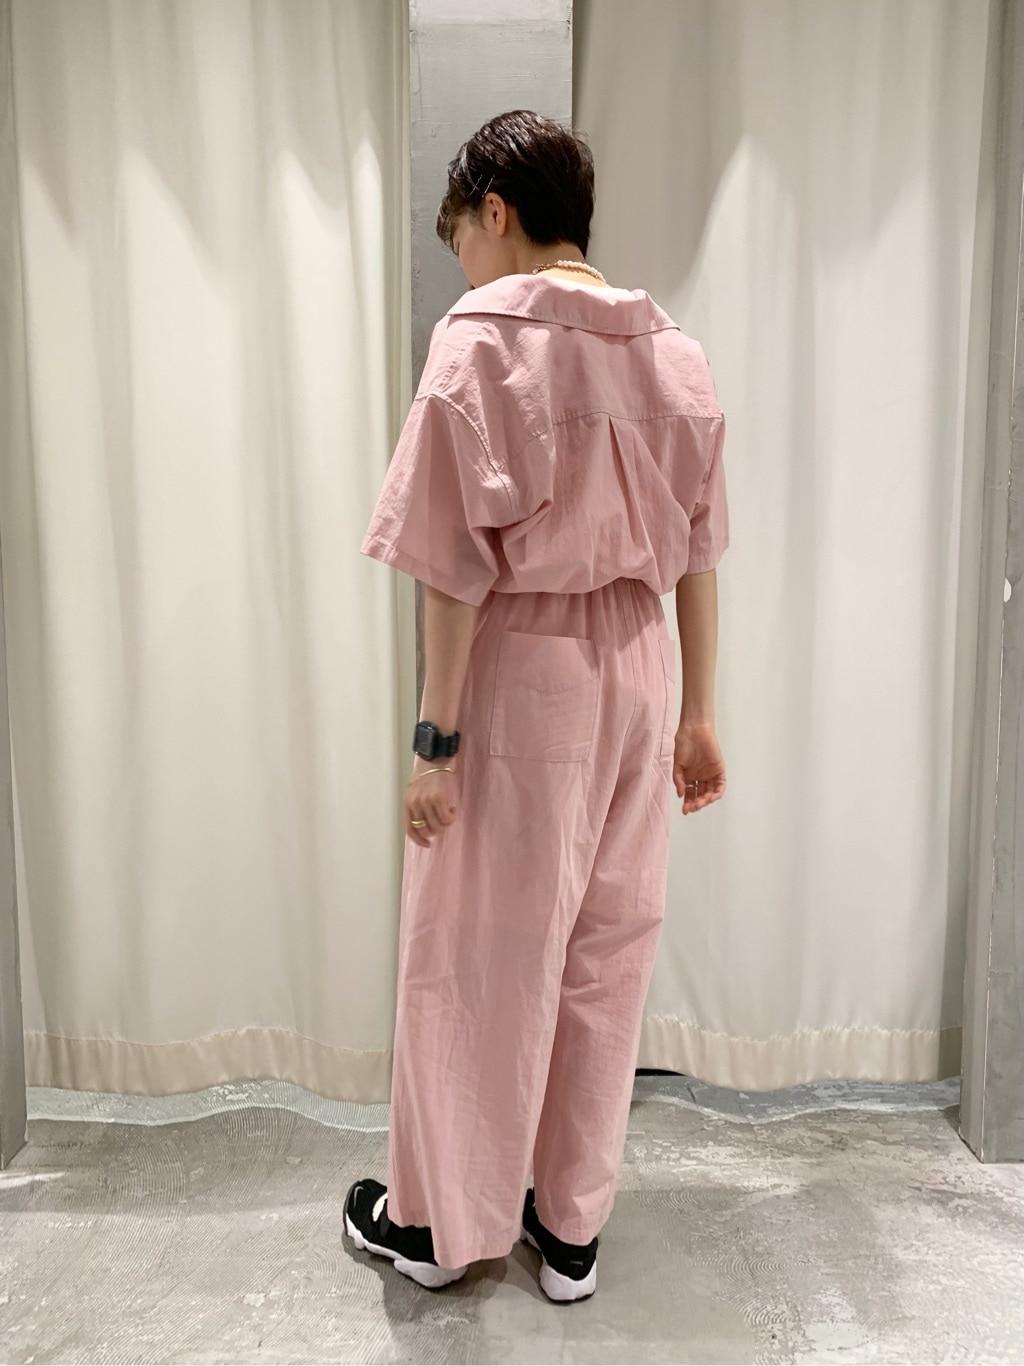 - CHILD WOMAN CHILD WOMAN , PAR ICI ルミネ横浜 身長:158cm 2021.04.20